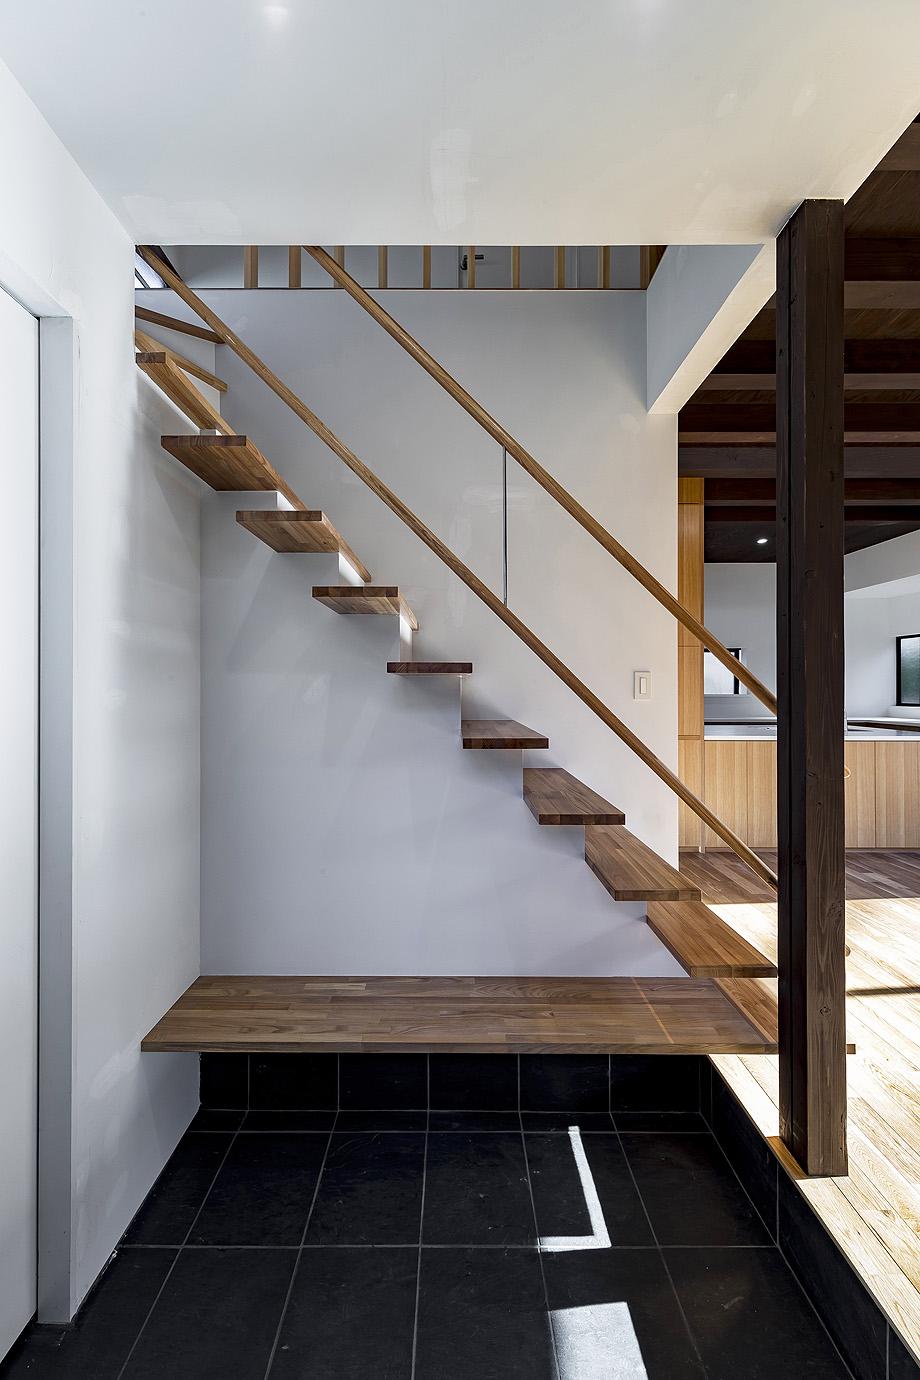 casa n de yds architects - foto nobuki taoka (17)